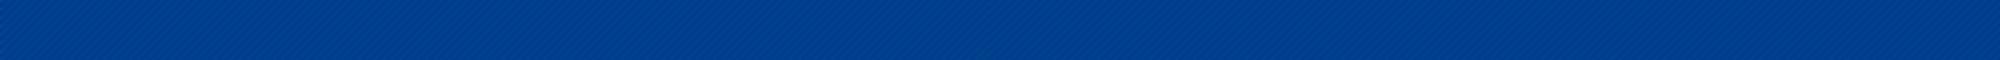 tax-blau-schwarz-weich-lang